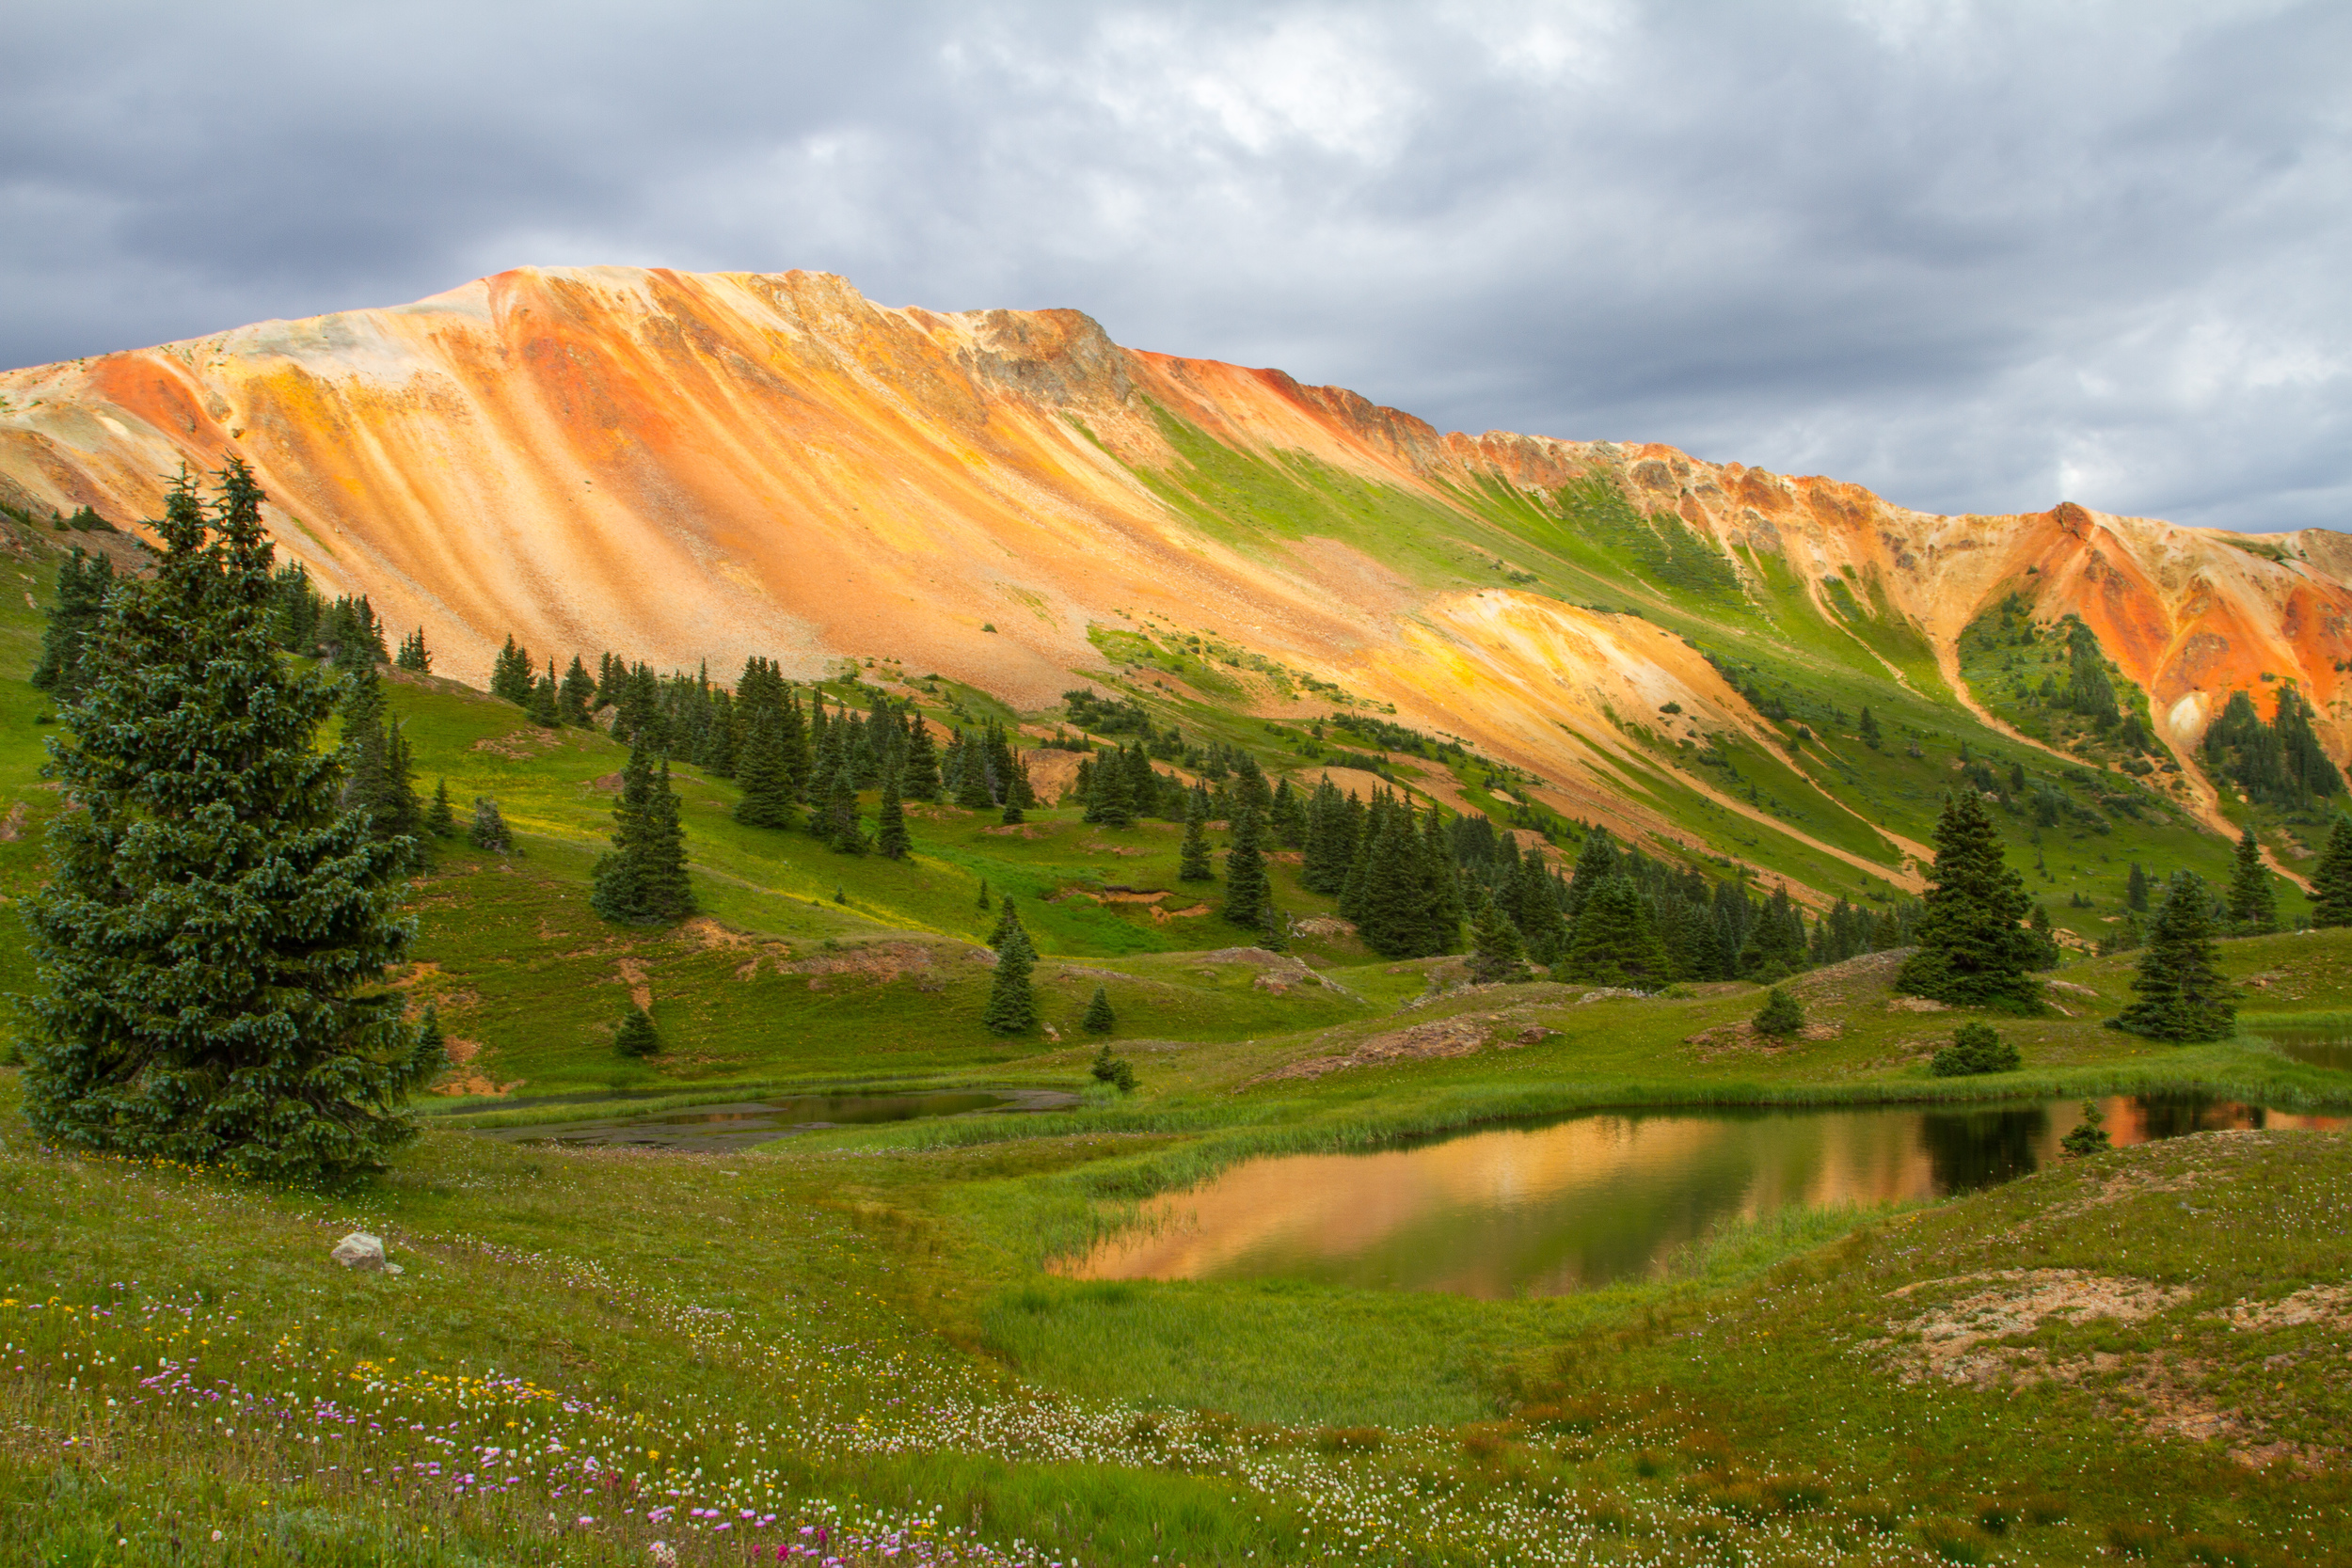 Gray Copper Gulch Pond Reflection, Image # 7687